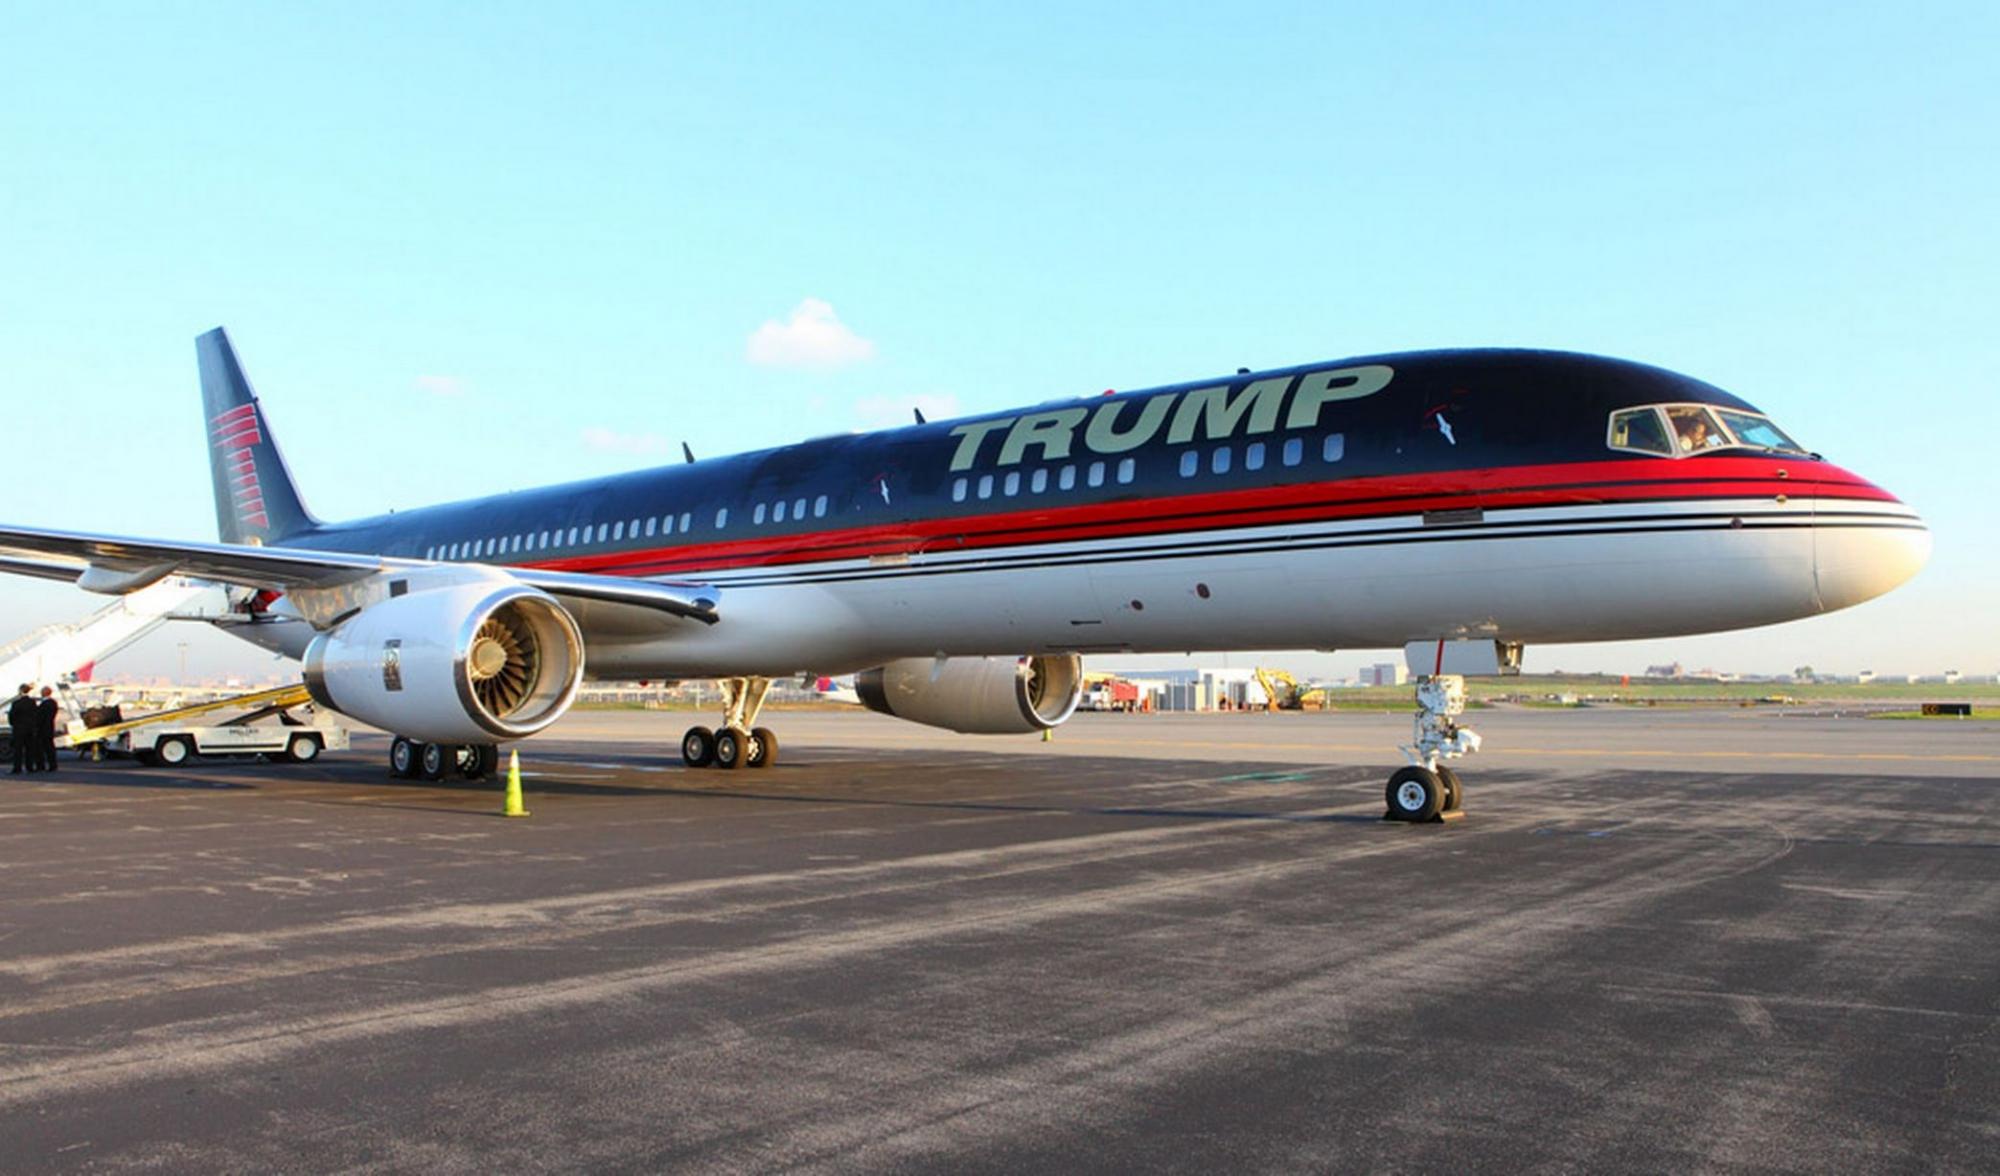 Donald Trump s plane makes emergency landing  Donald Trump s plane makes  emergency landing Donald. Donald Trump39s New   makitaserviciopanama com